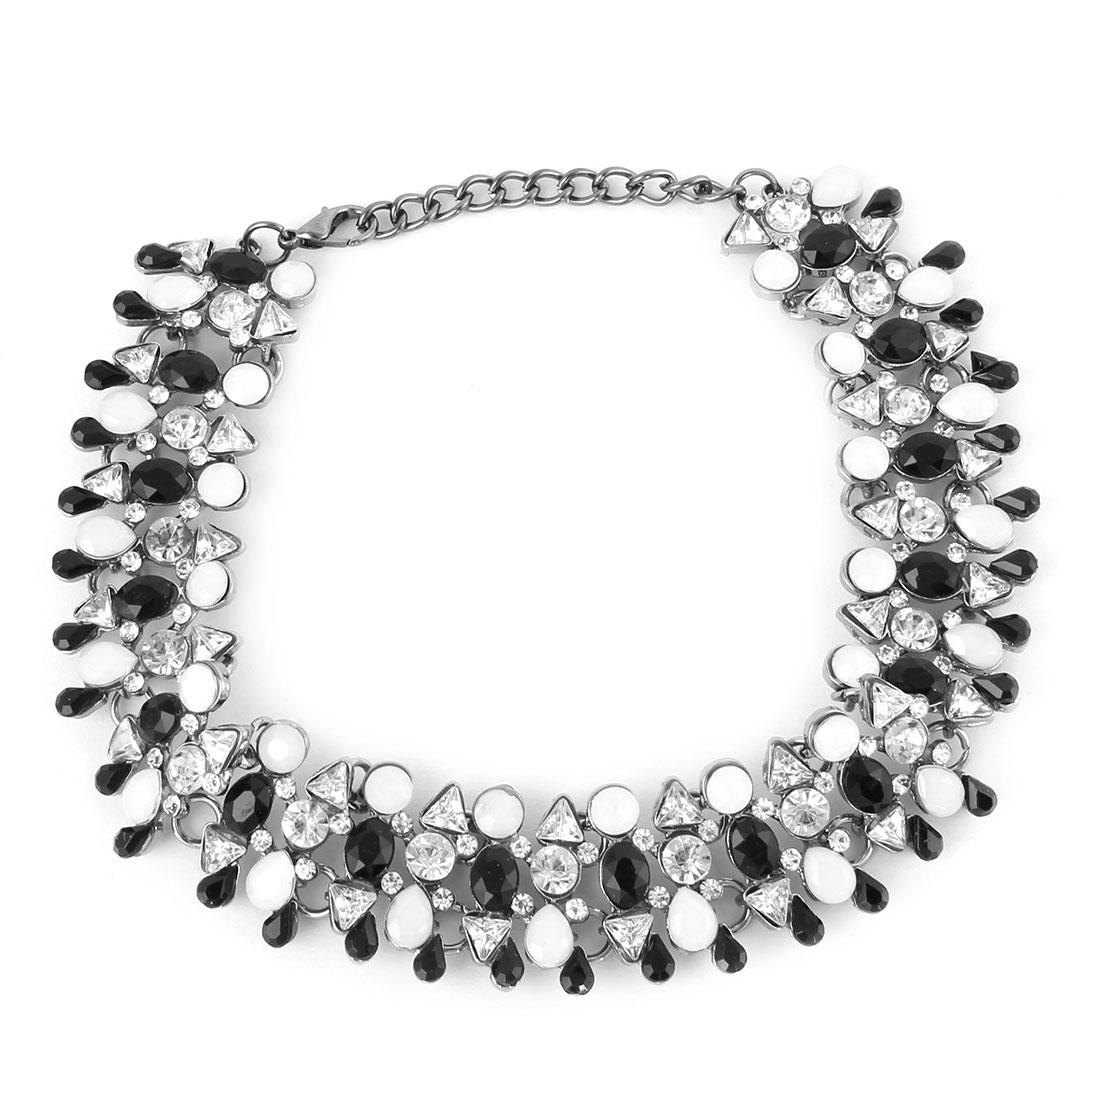 Women Metal Luxury Bib Collar Charming Choker Necklace Black White